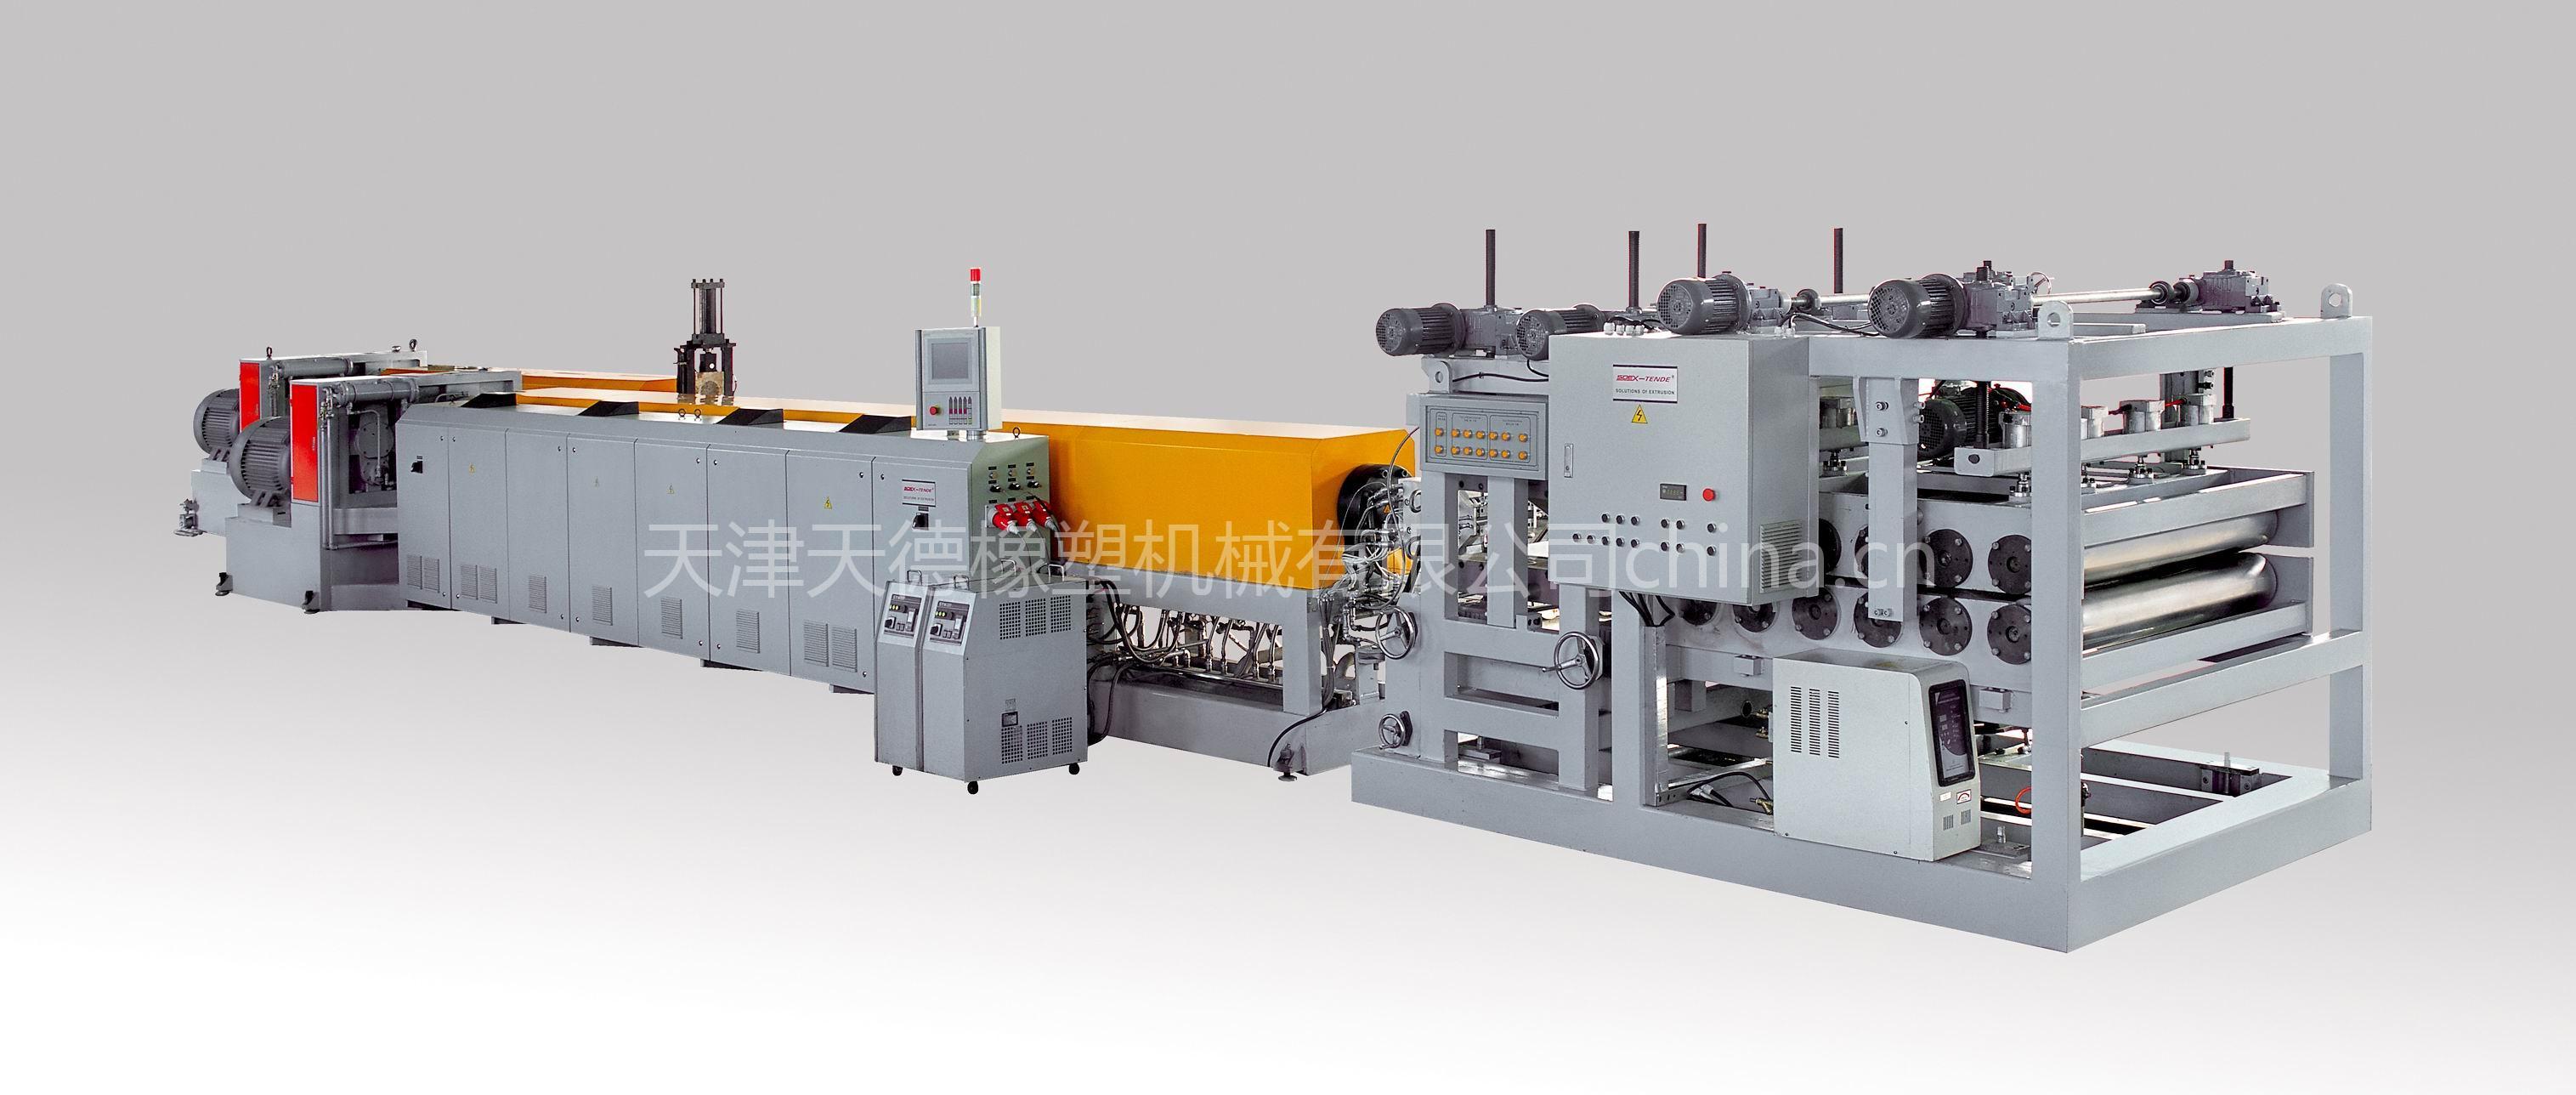 XPS保温板生产线,塑料机械设备